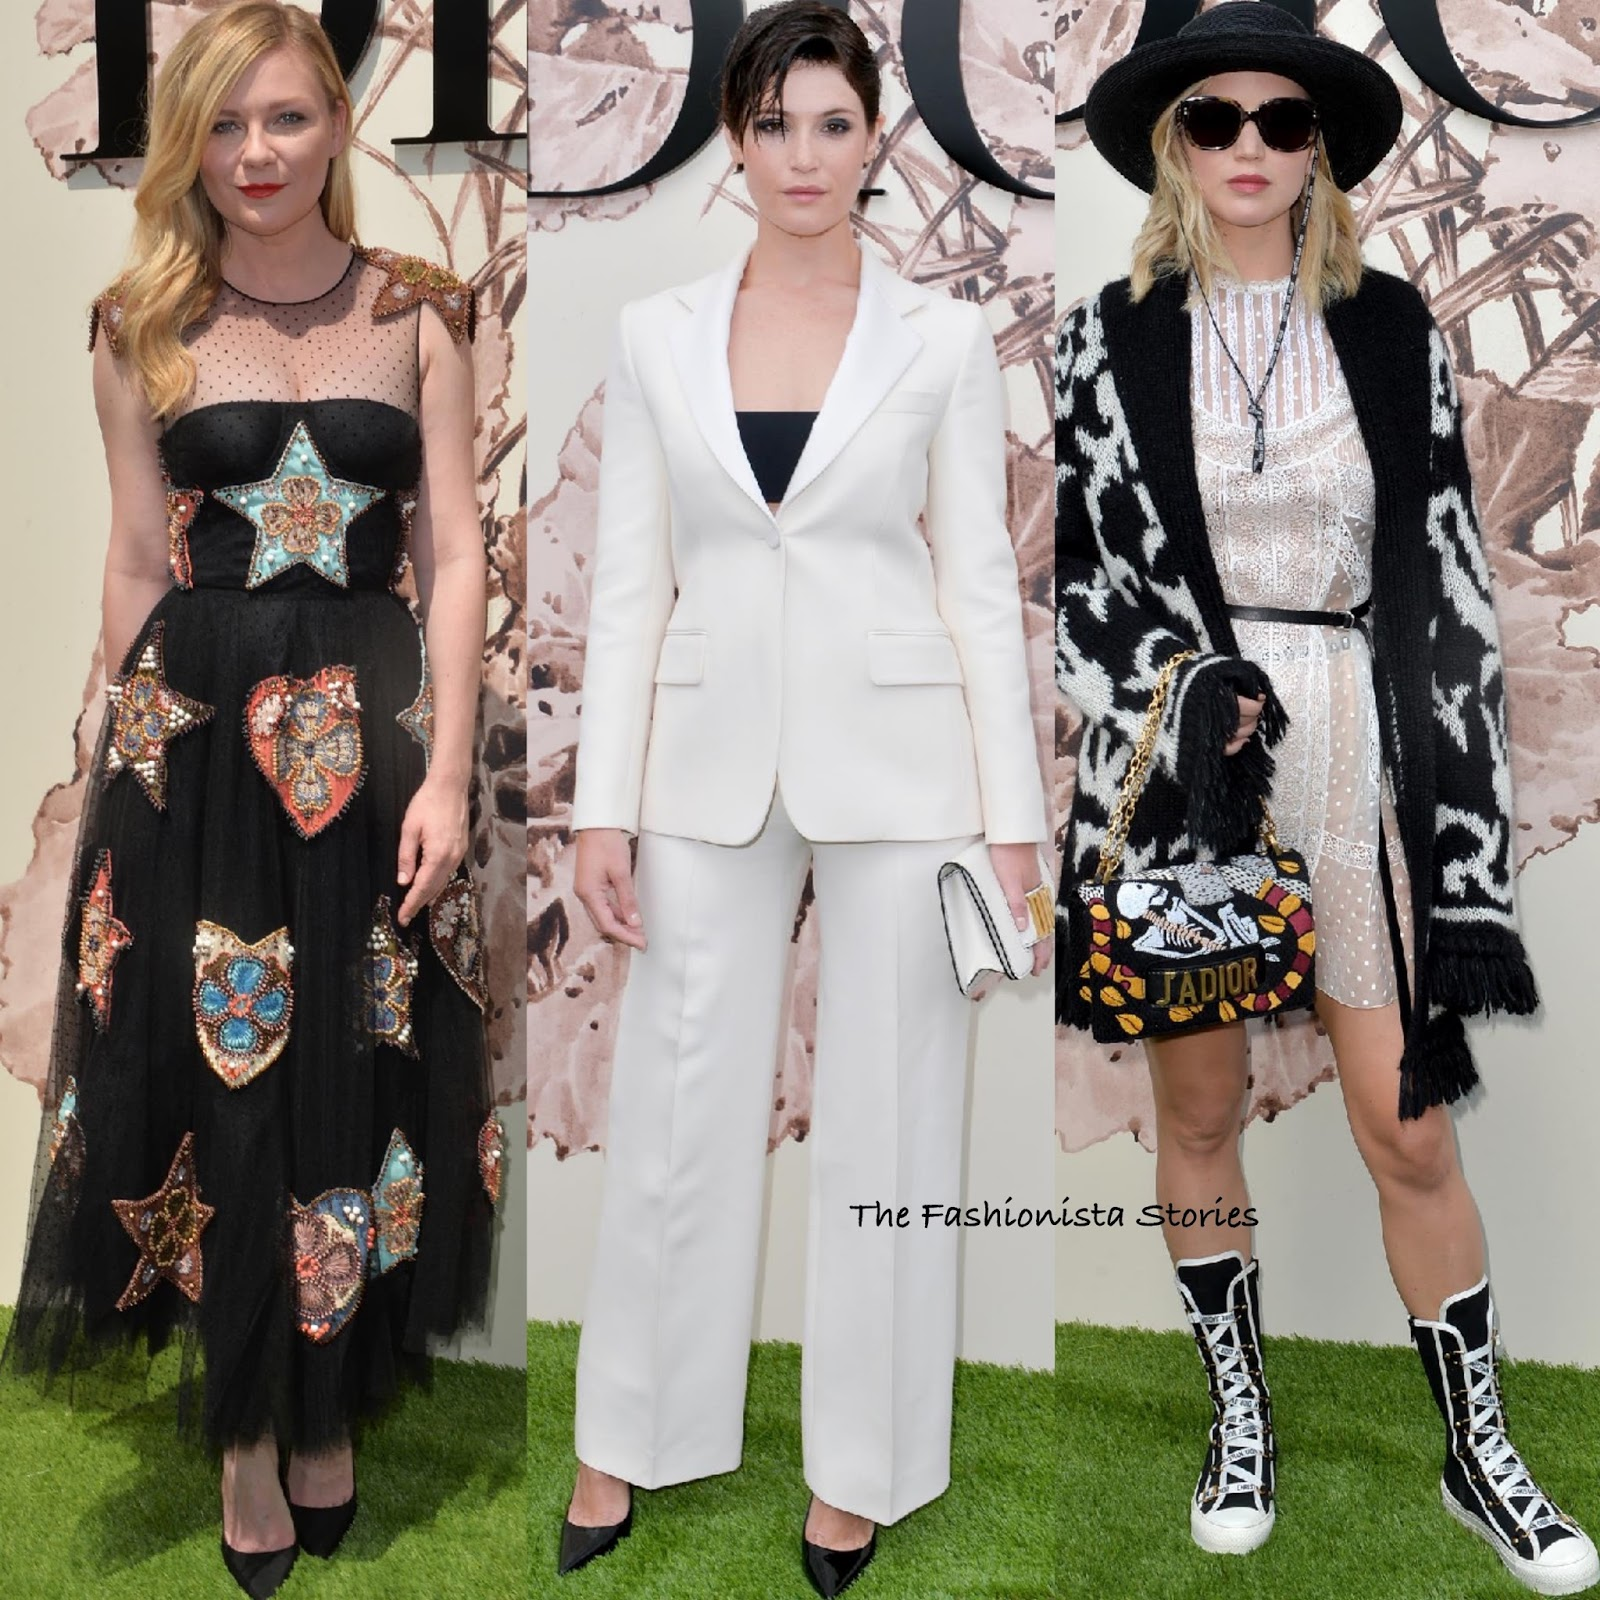 Christian Dior F W 2017 Haute Couture Paris Fashion Show 317d352860bbe